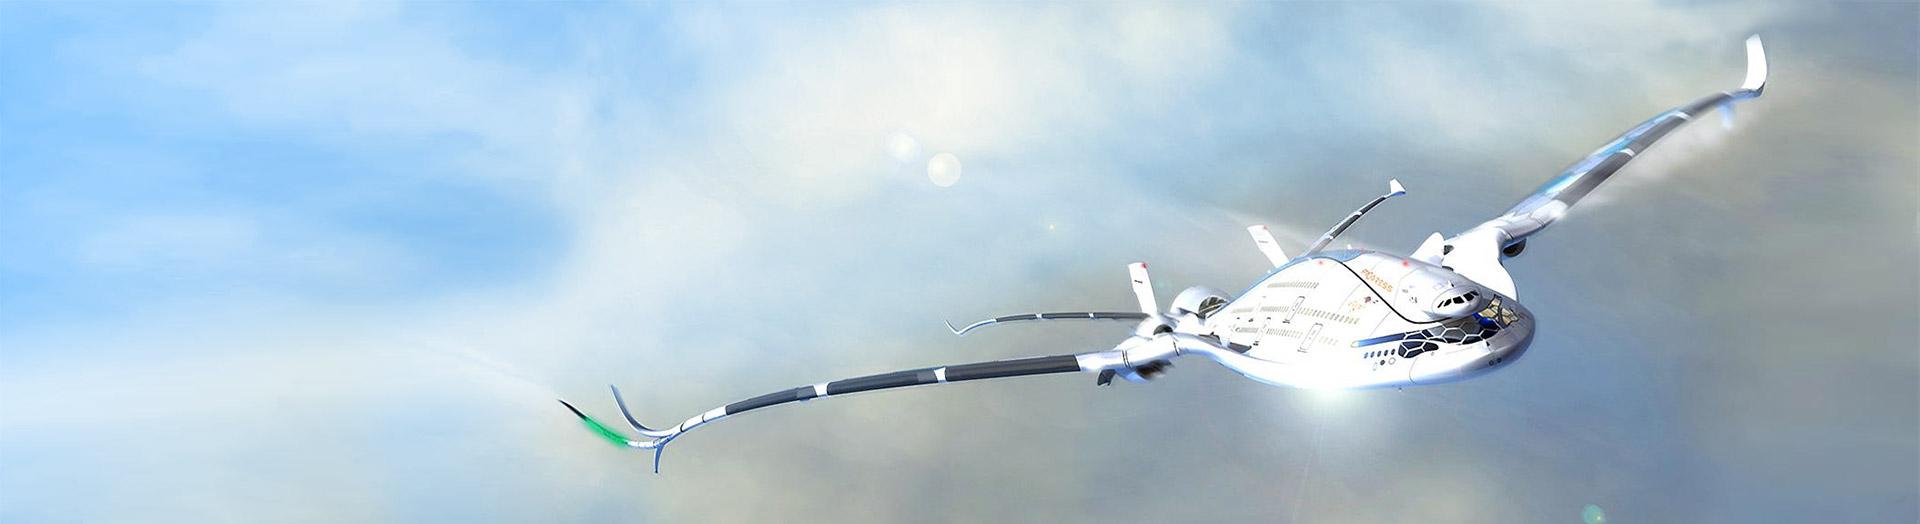 clean-skies-bbc-1920x524.jpg